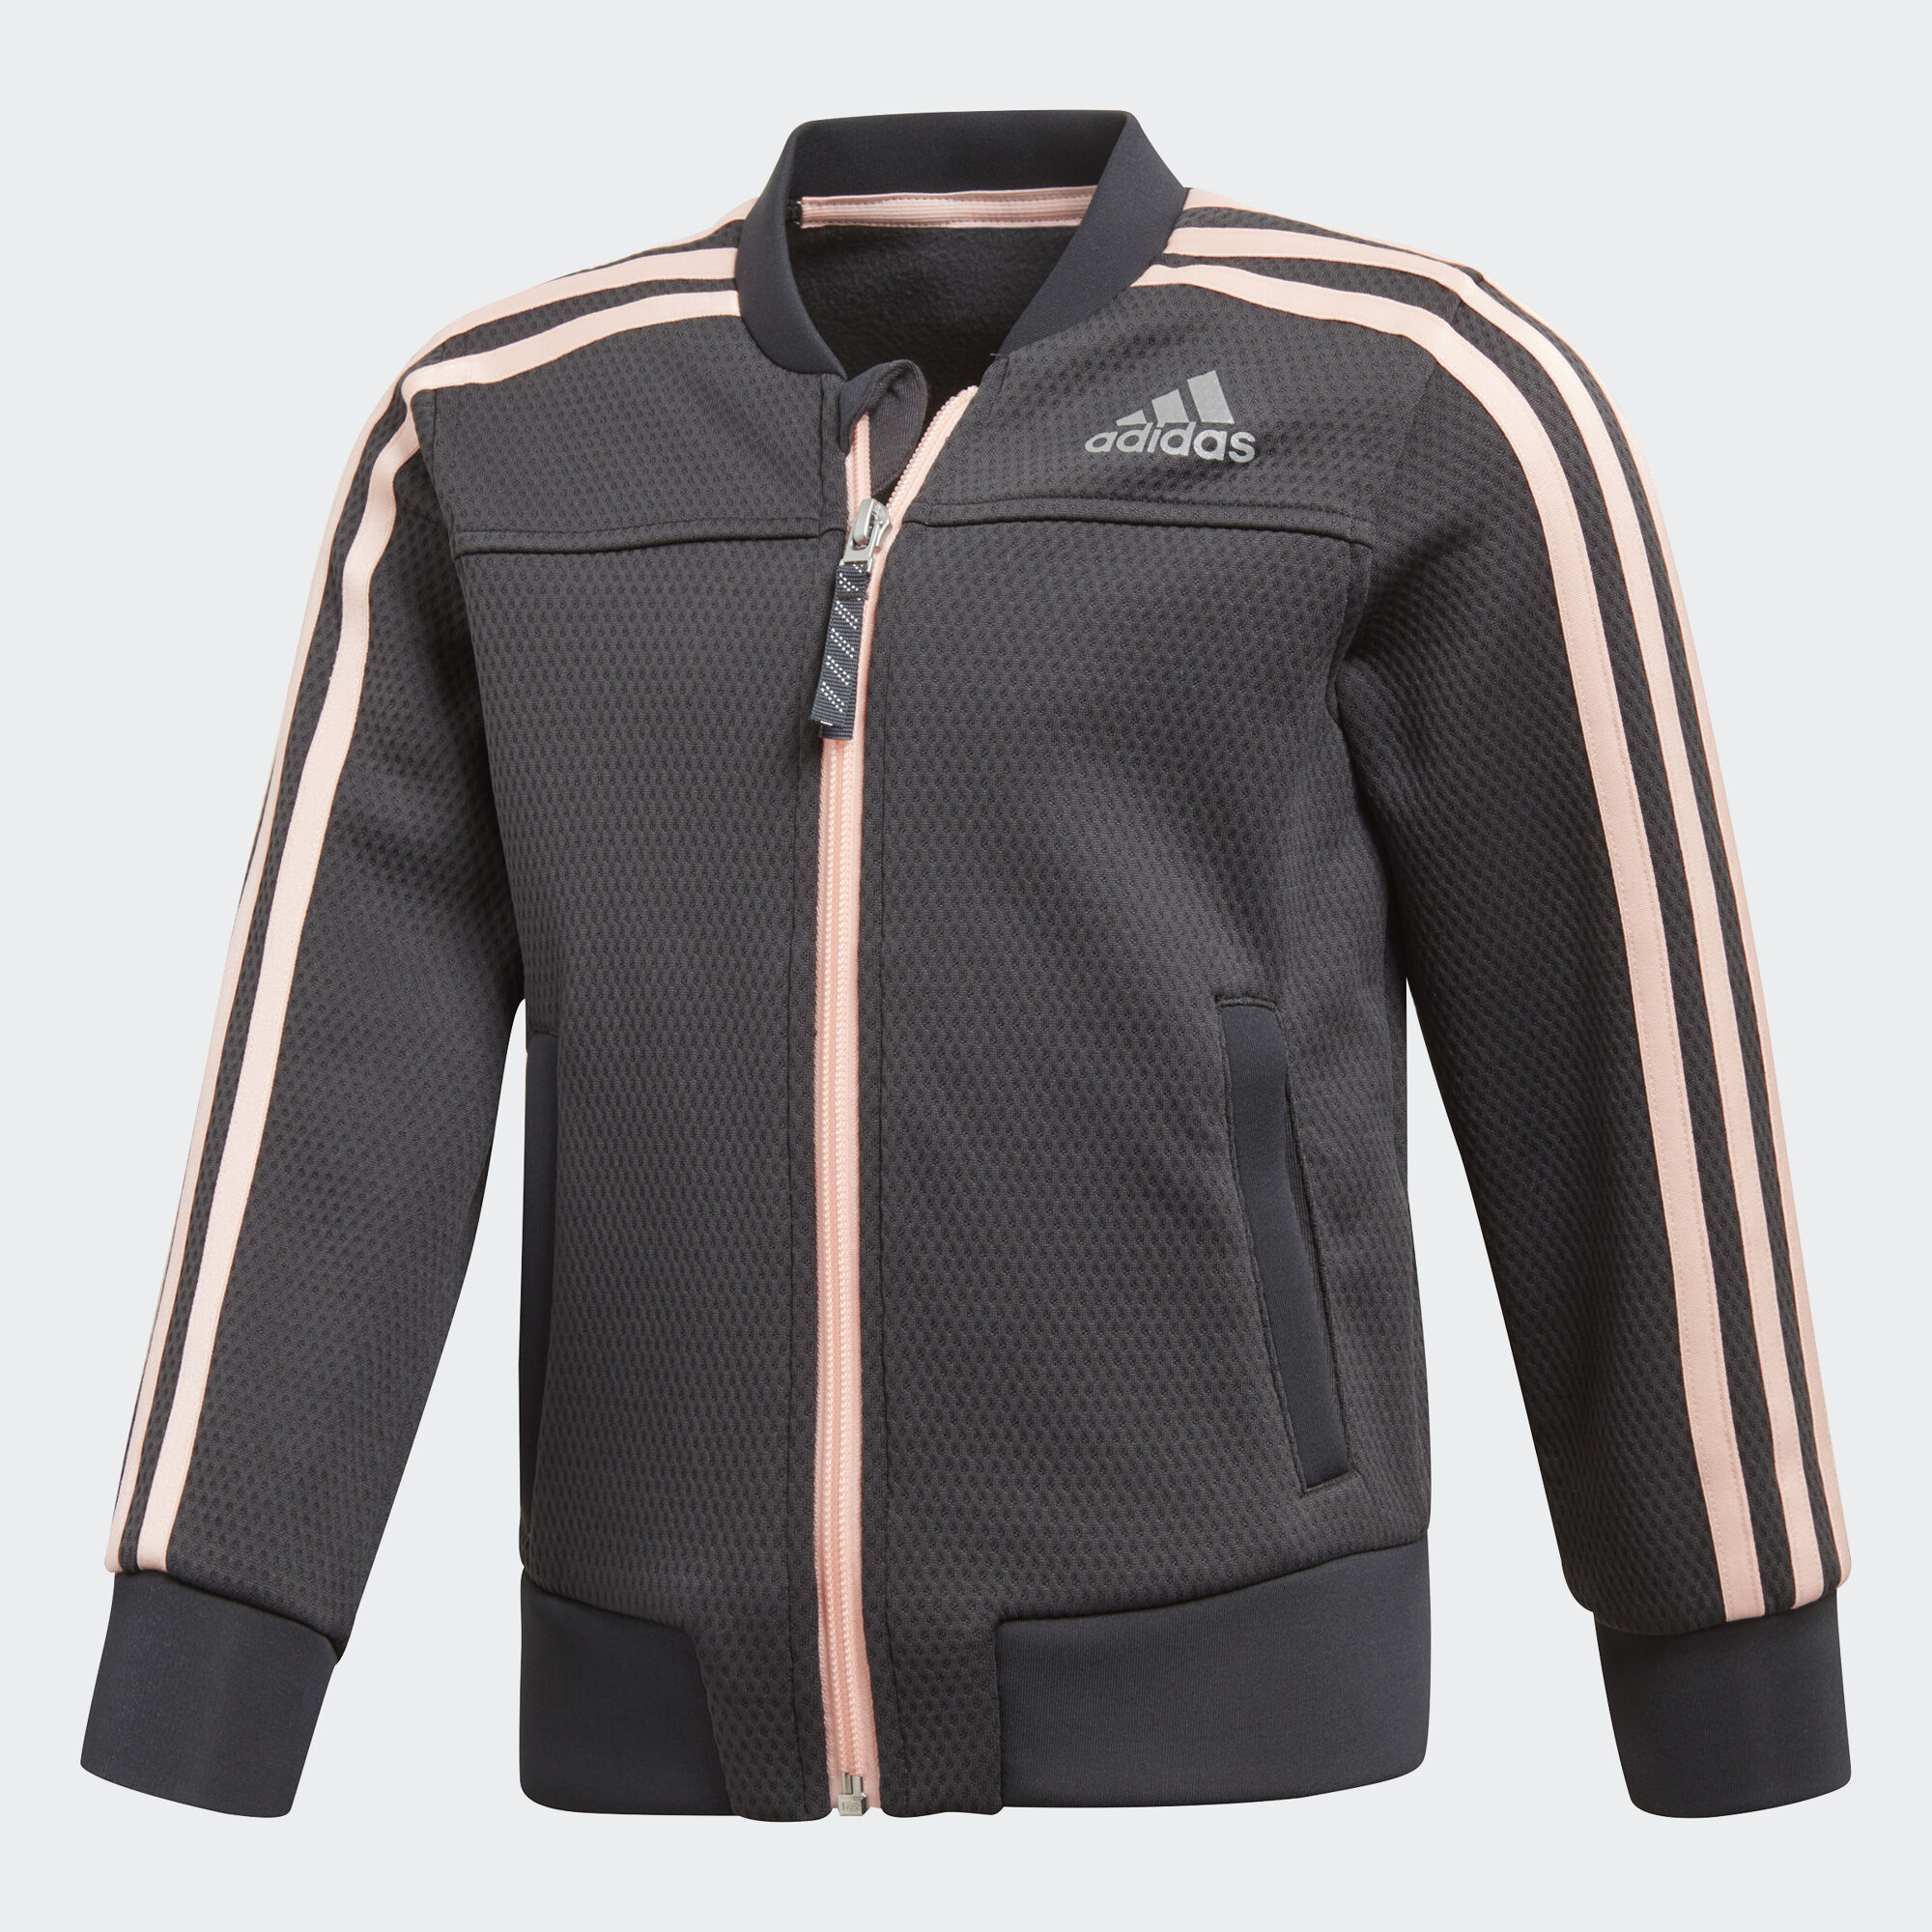 7d172228b91 Mlt Cinzento Up Adidas Casaco Cover wOf7g